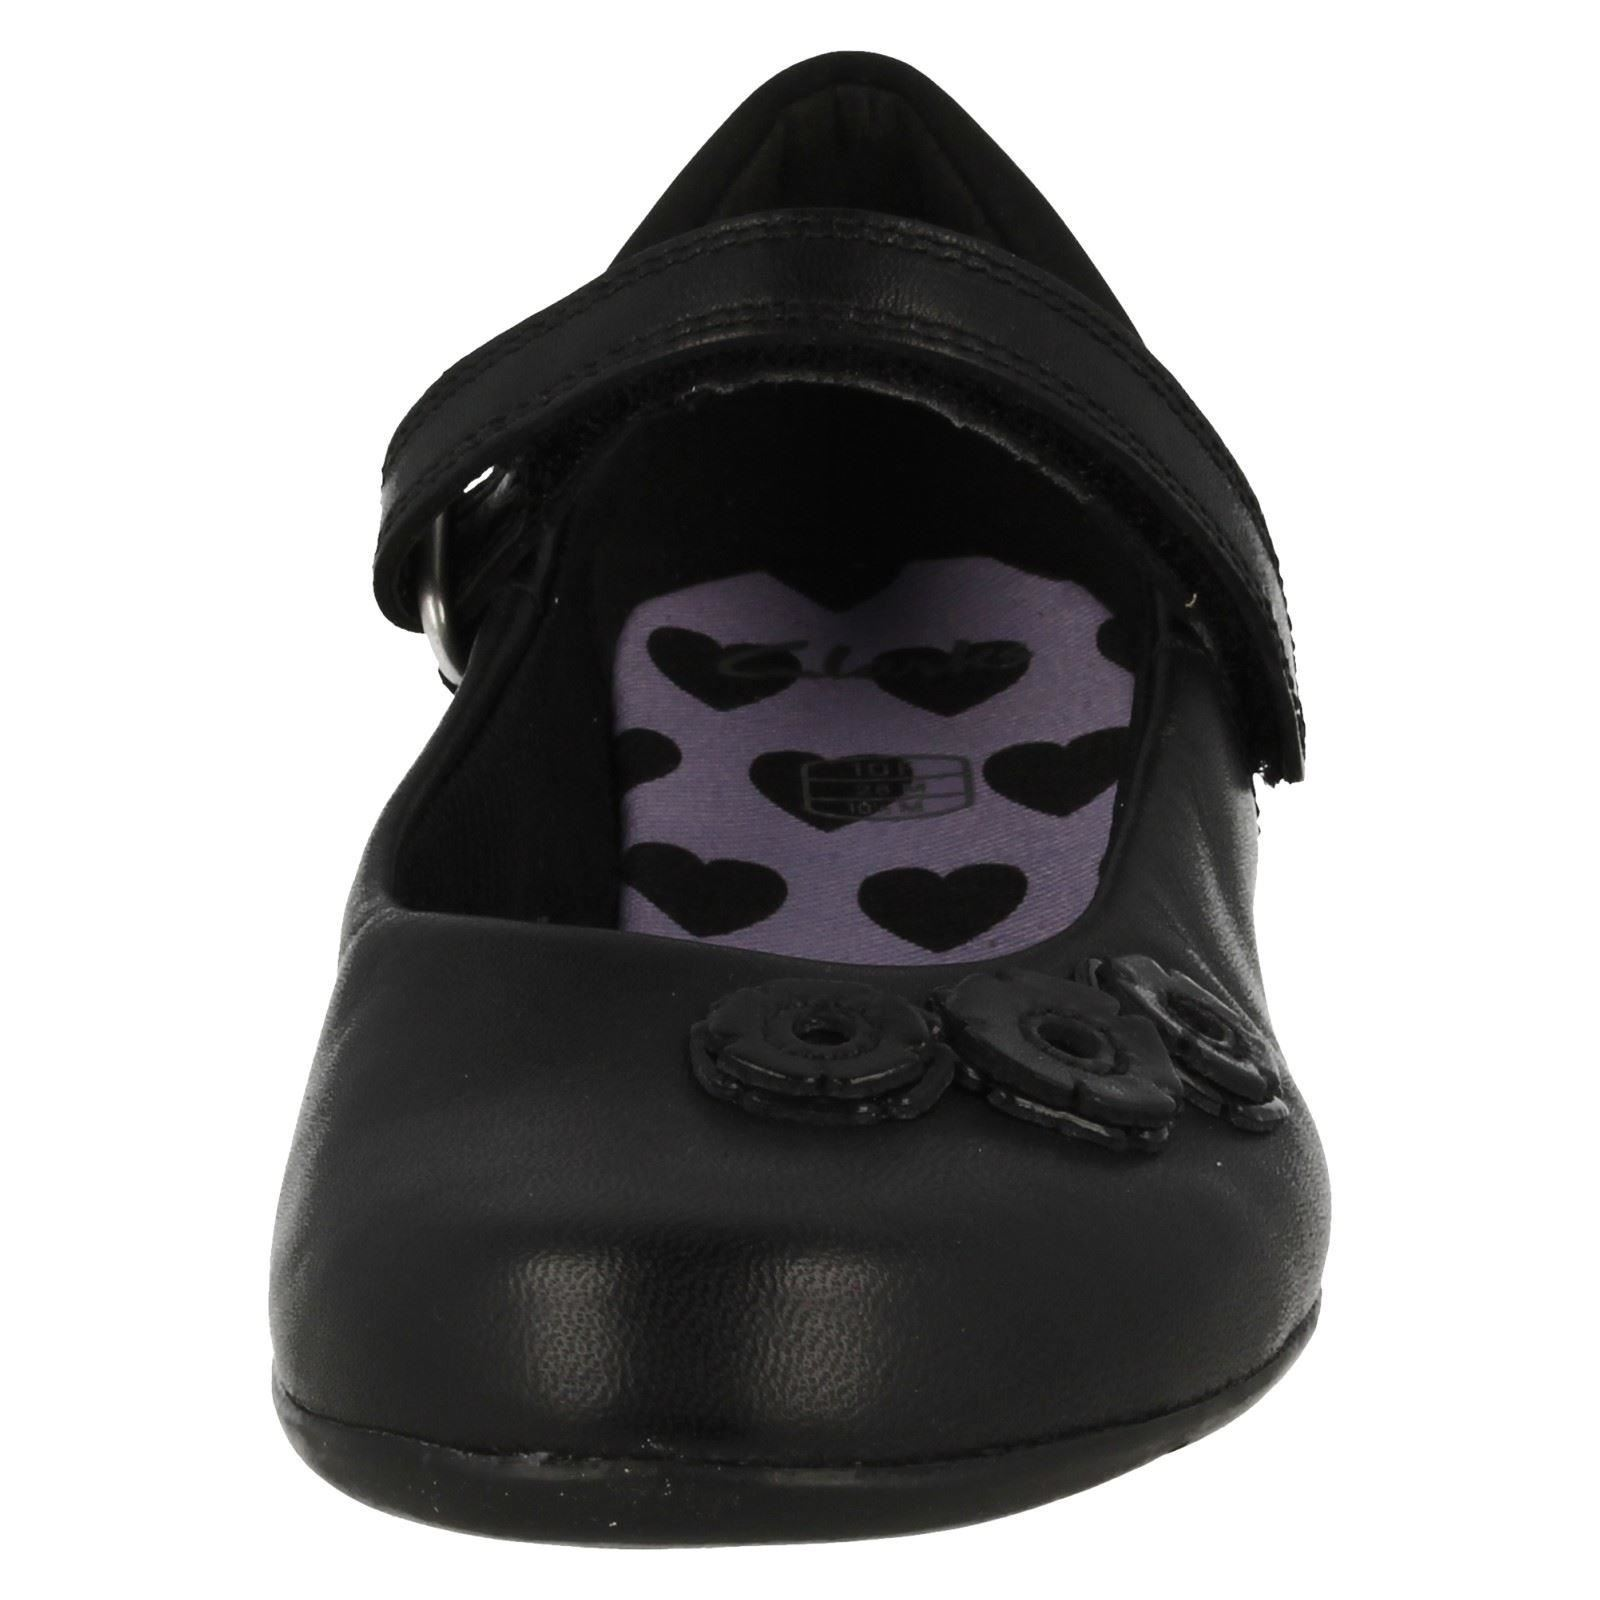 Girls Clarks Mary Jane School Shoes Dance Crush